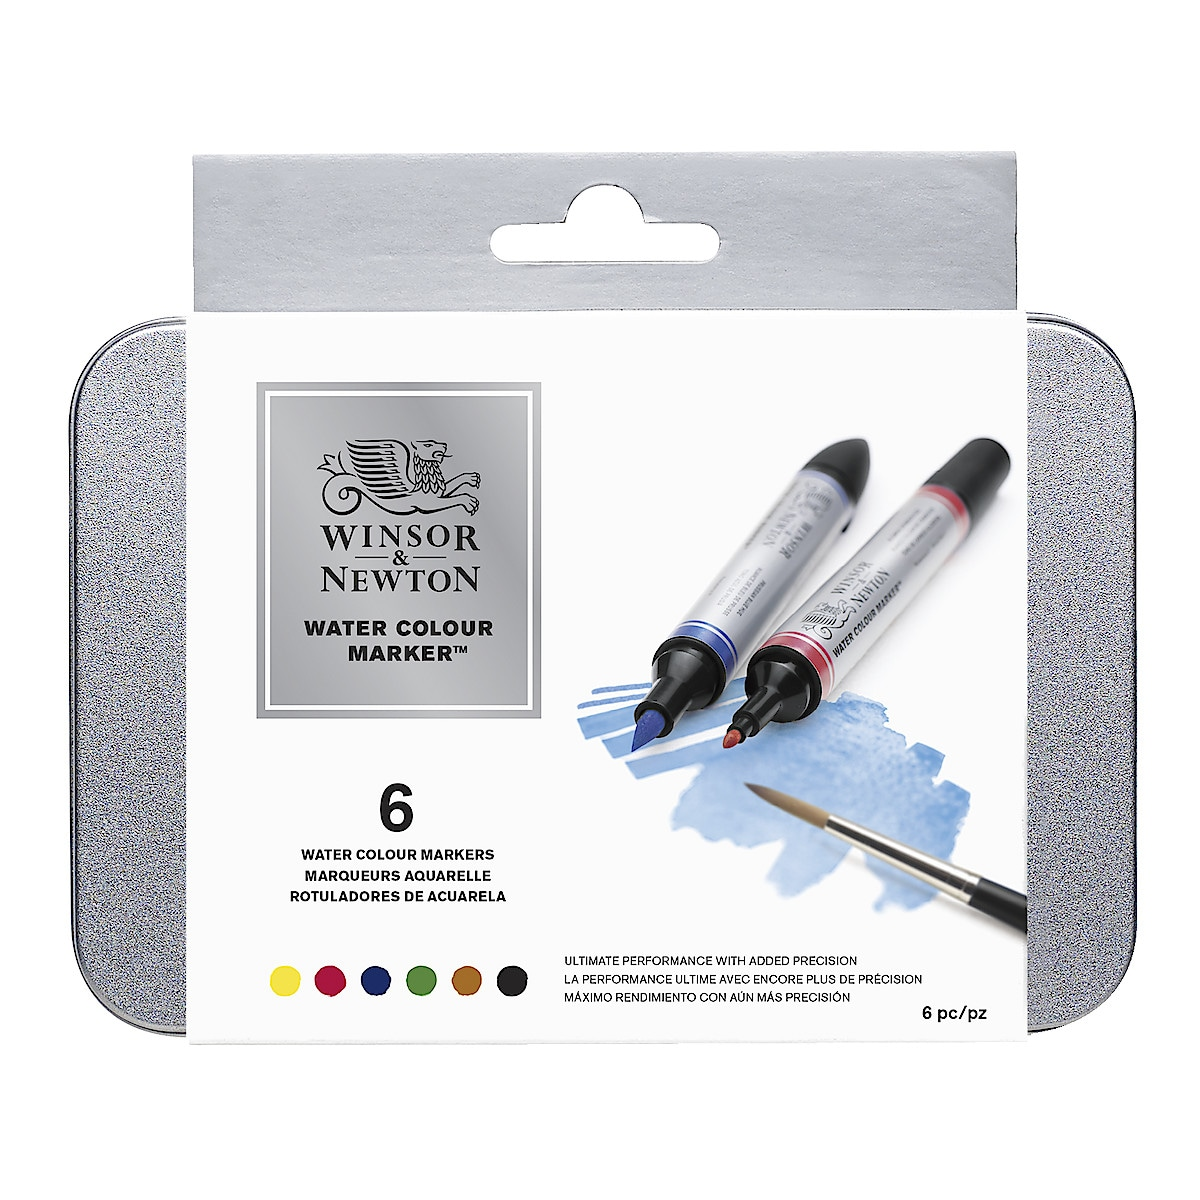 Akvarellilehtiö ja kynät